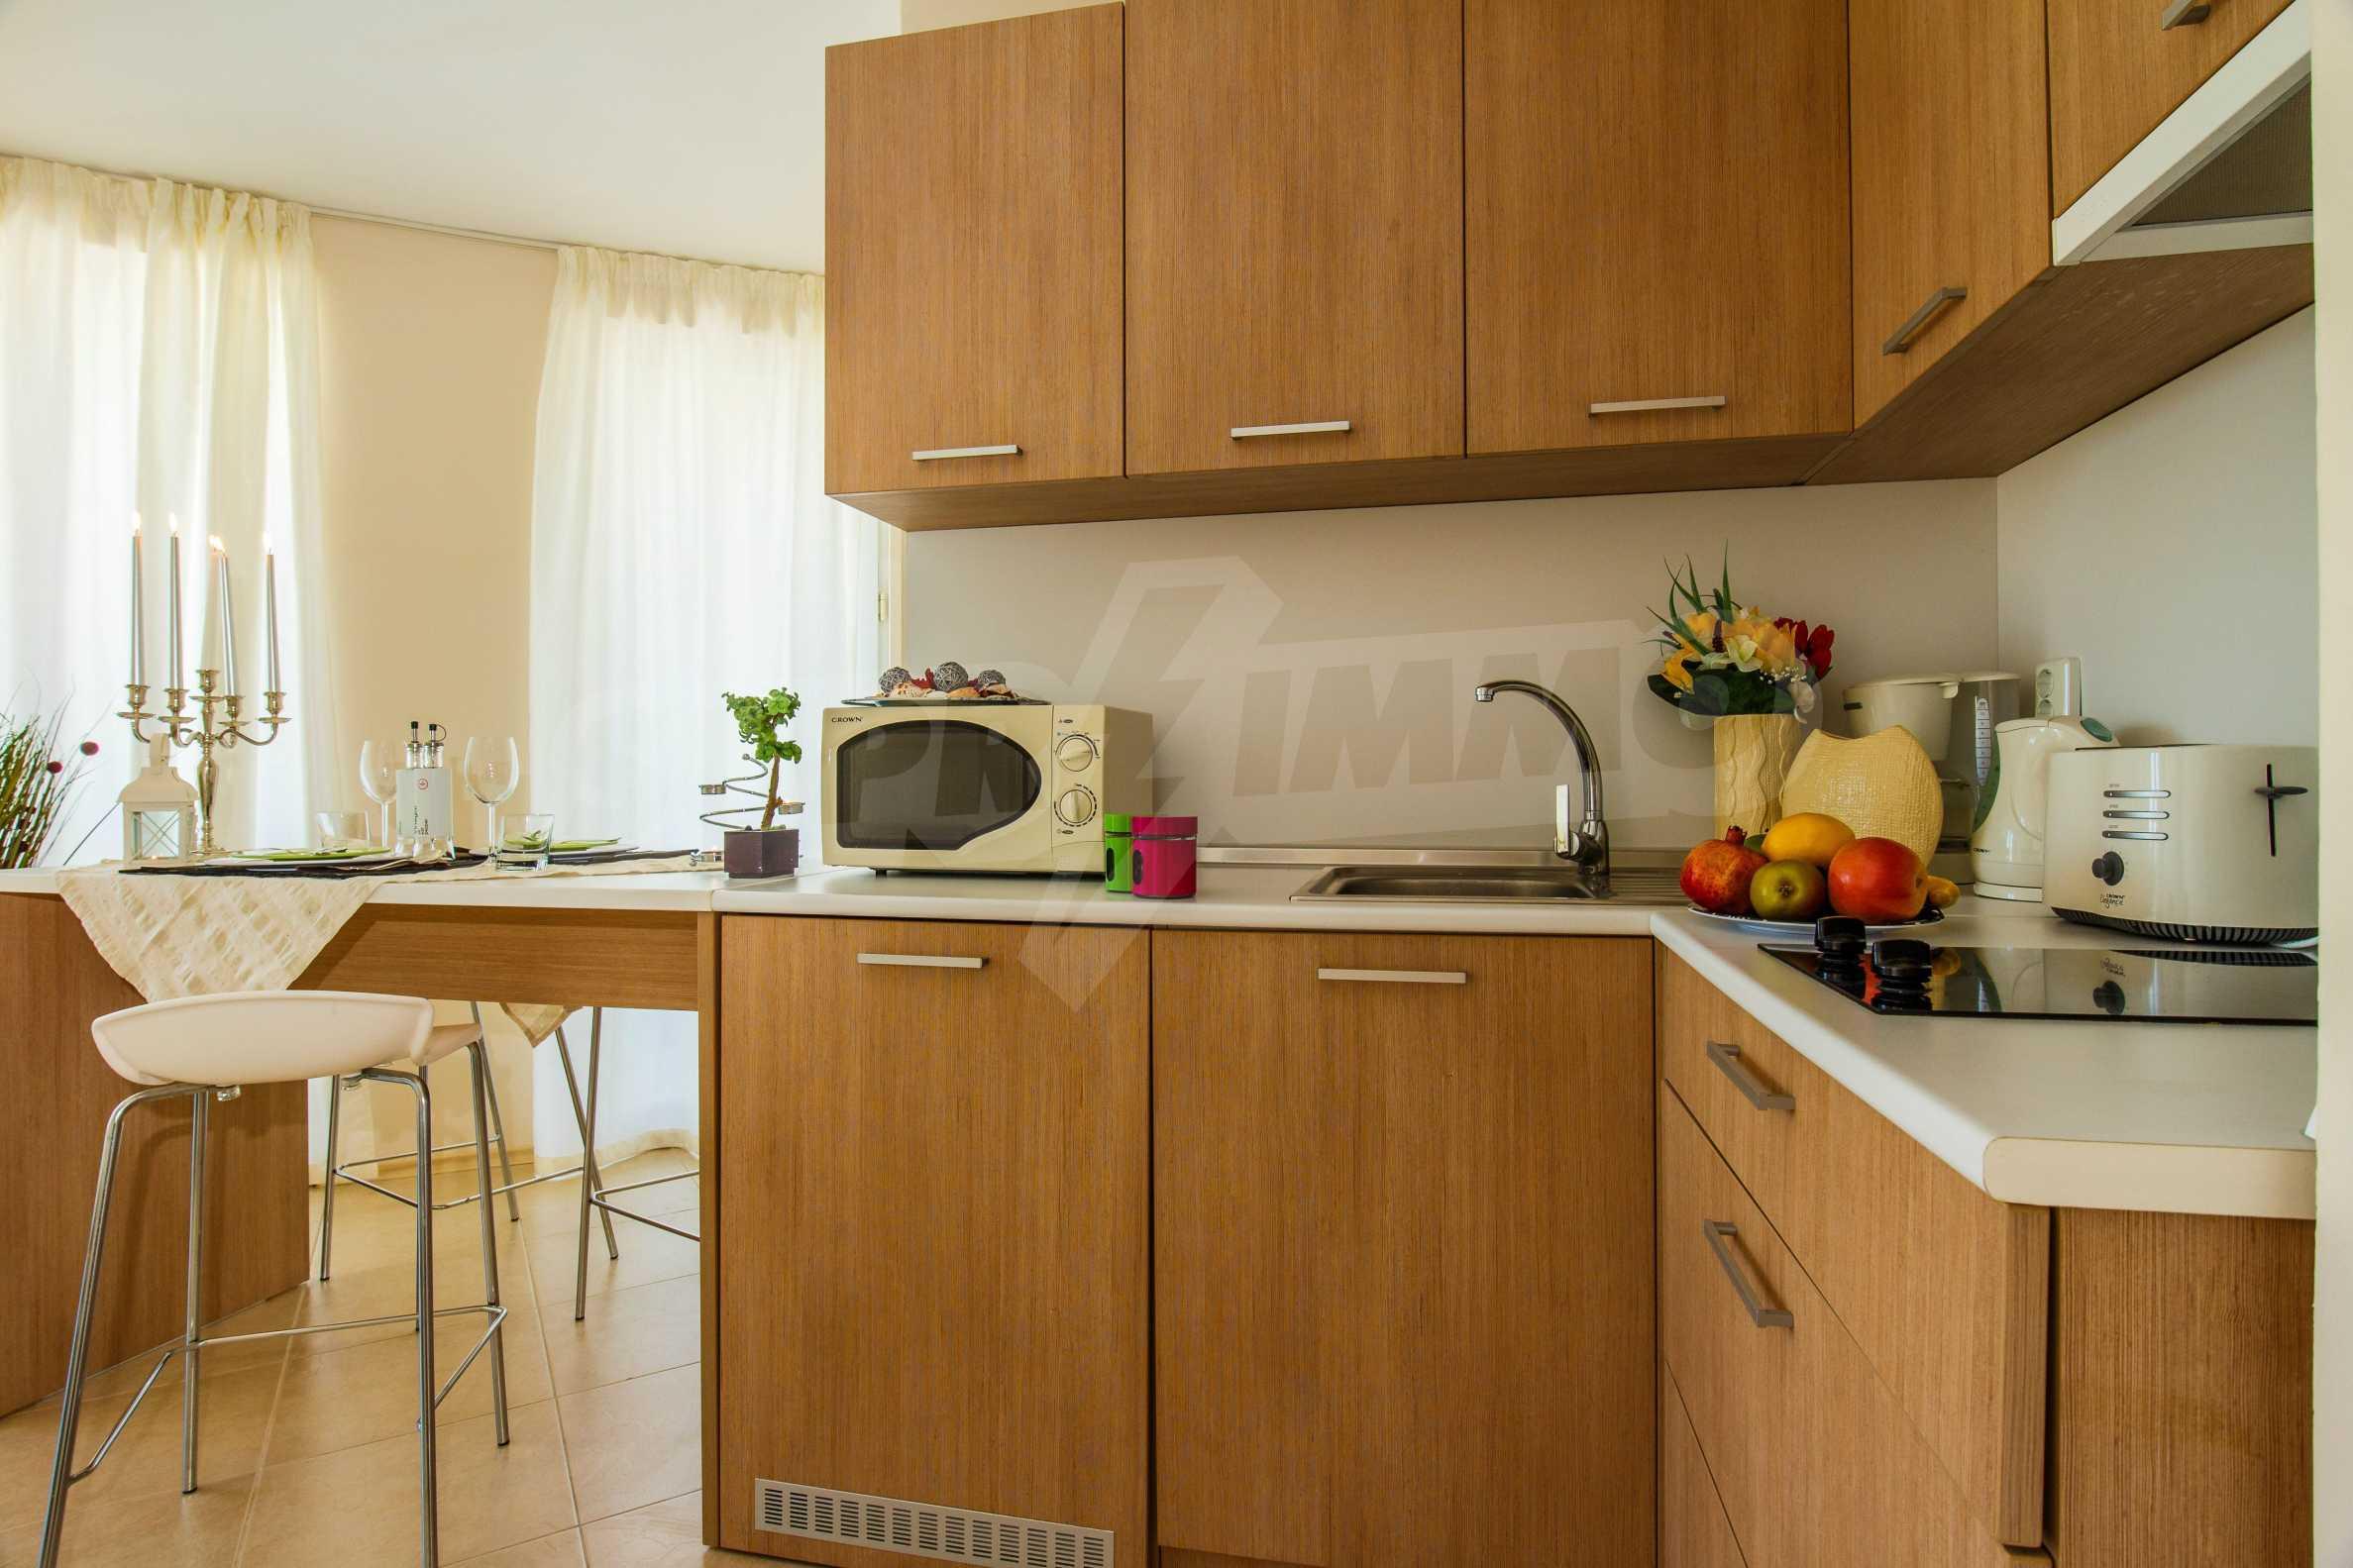 Тристаен апартамент в комплекс Емберли близо до плажа в Лозенец (ап. №423) 12